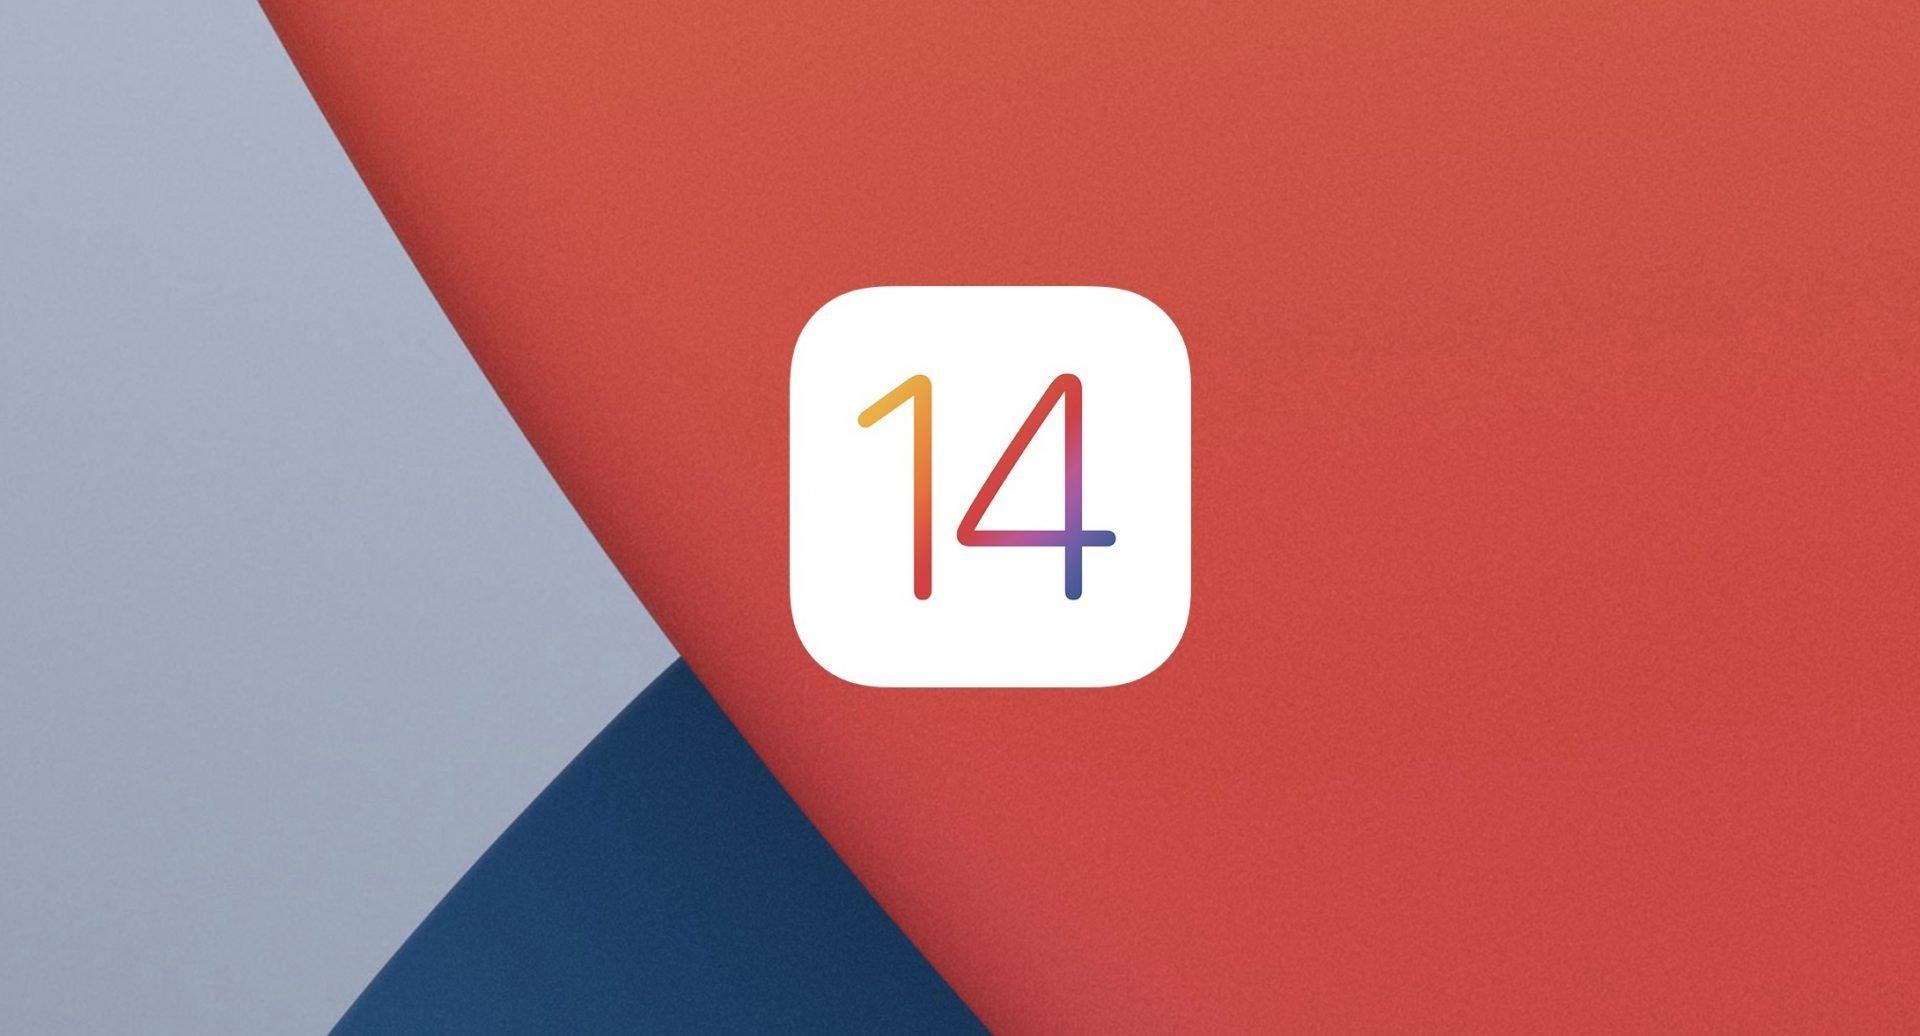 iOS 14升级率已超越25%:用户更新意愿胜iOS 13